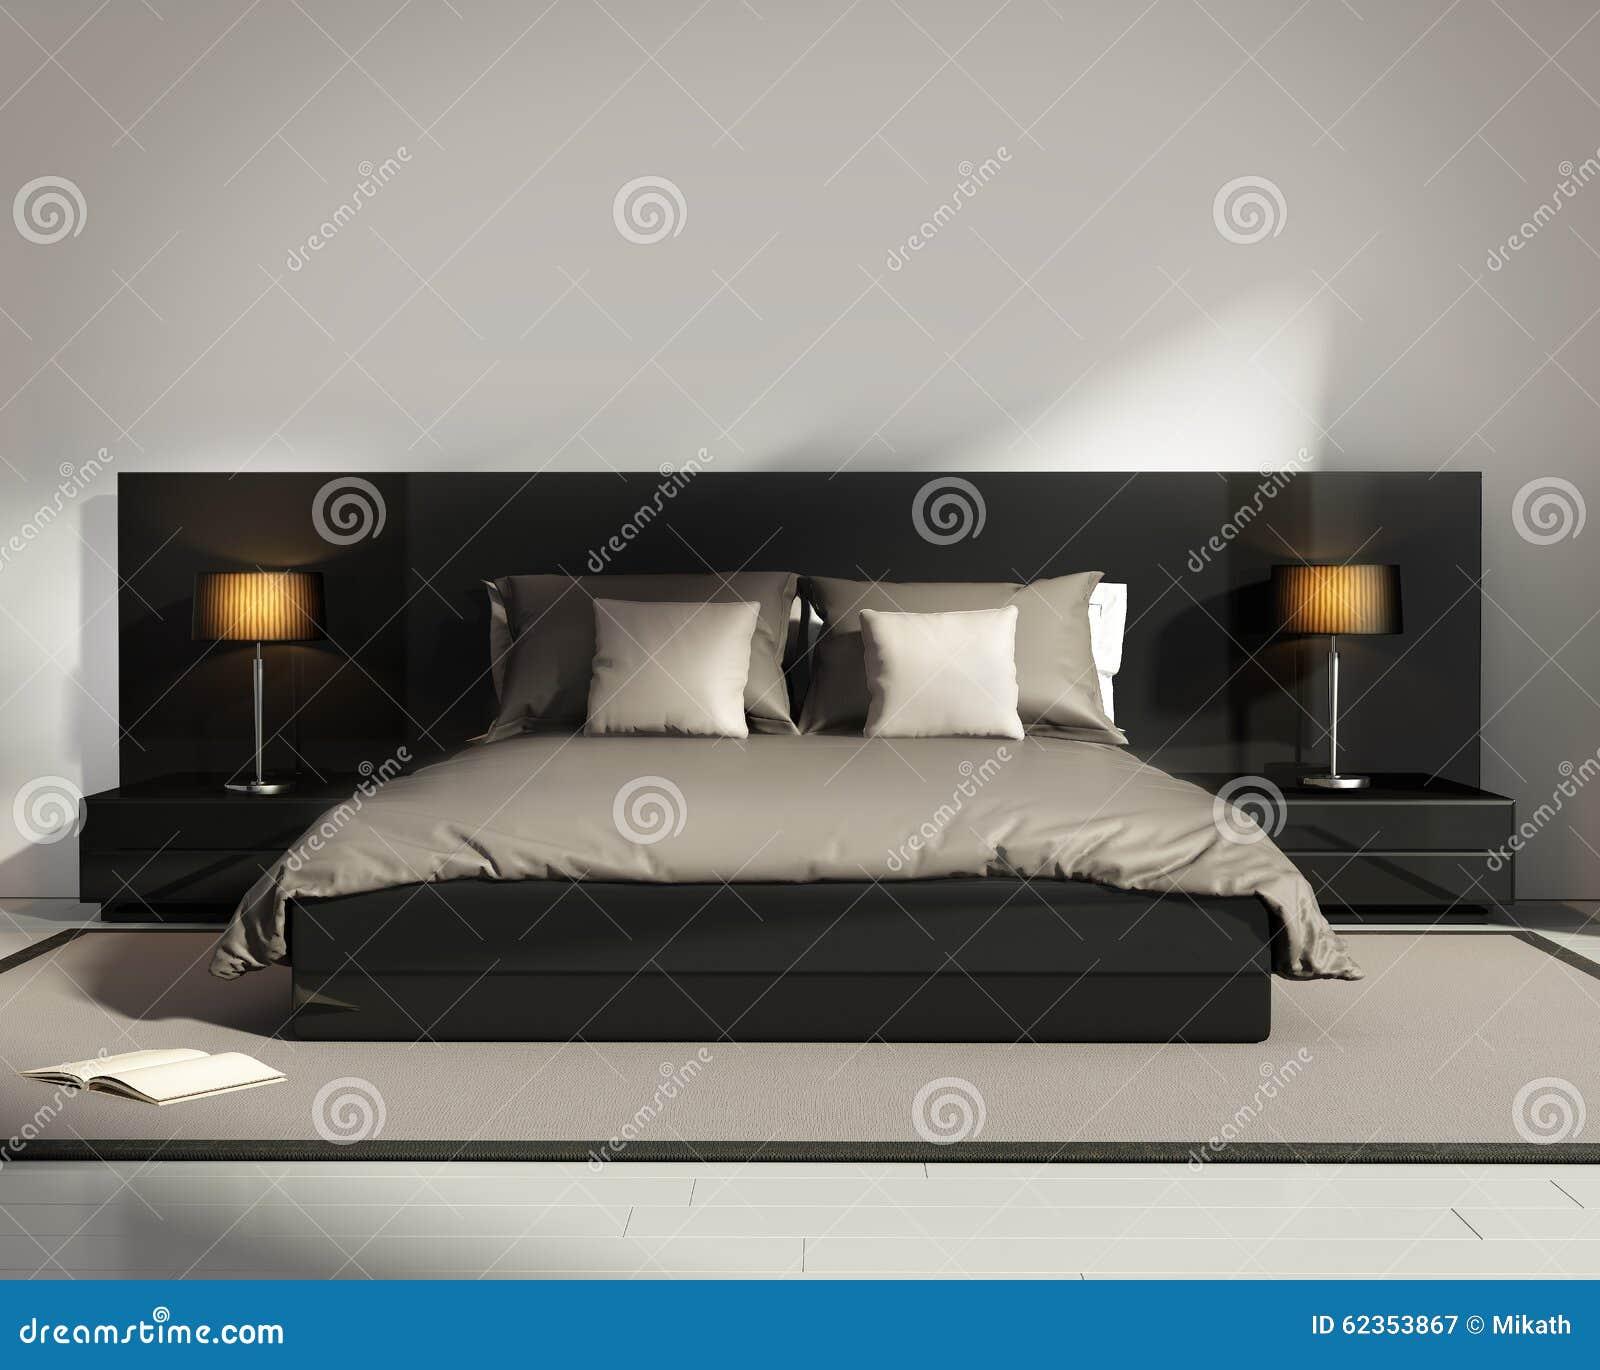 Eigentijdse elegante luxe zwarte slaapkamer stock illustratie afbeelding 62353867 - Eigentijdse slaapkamer ...